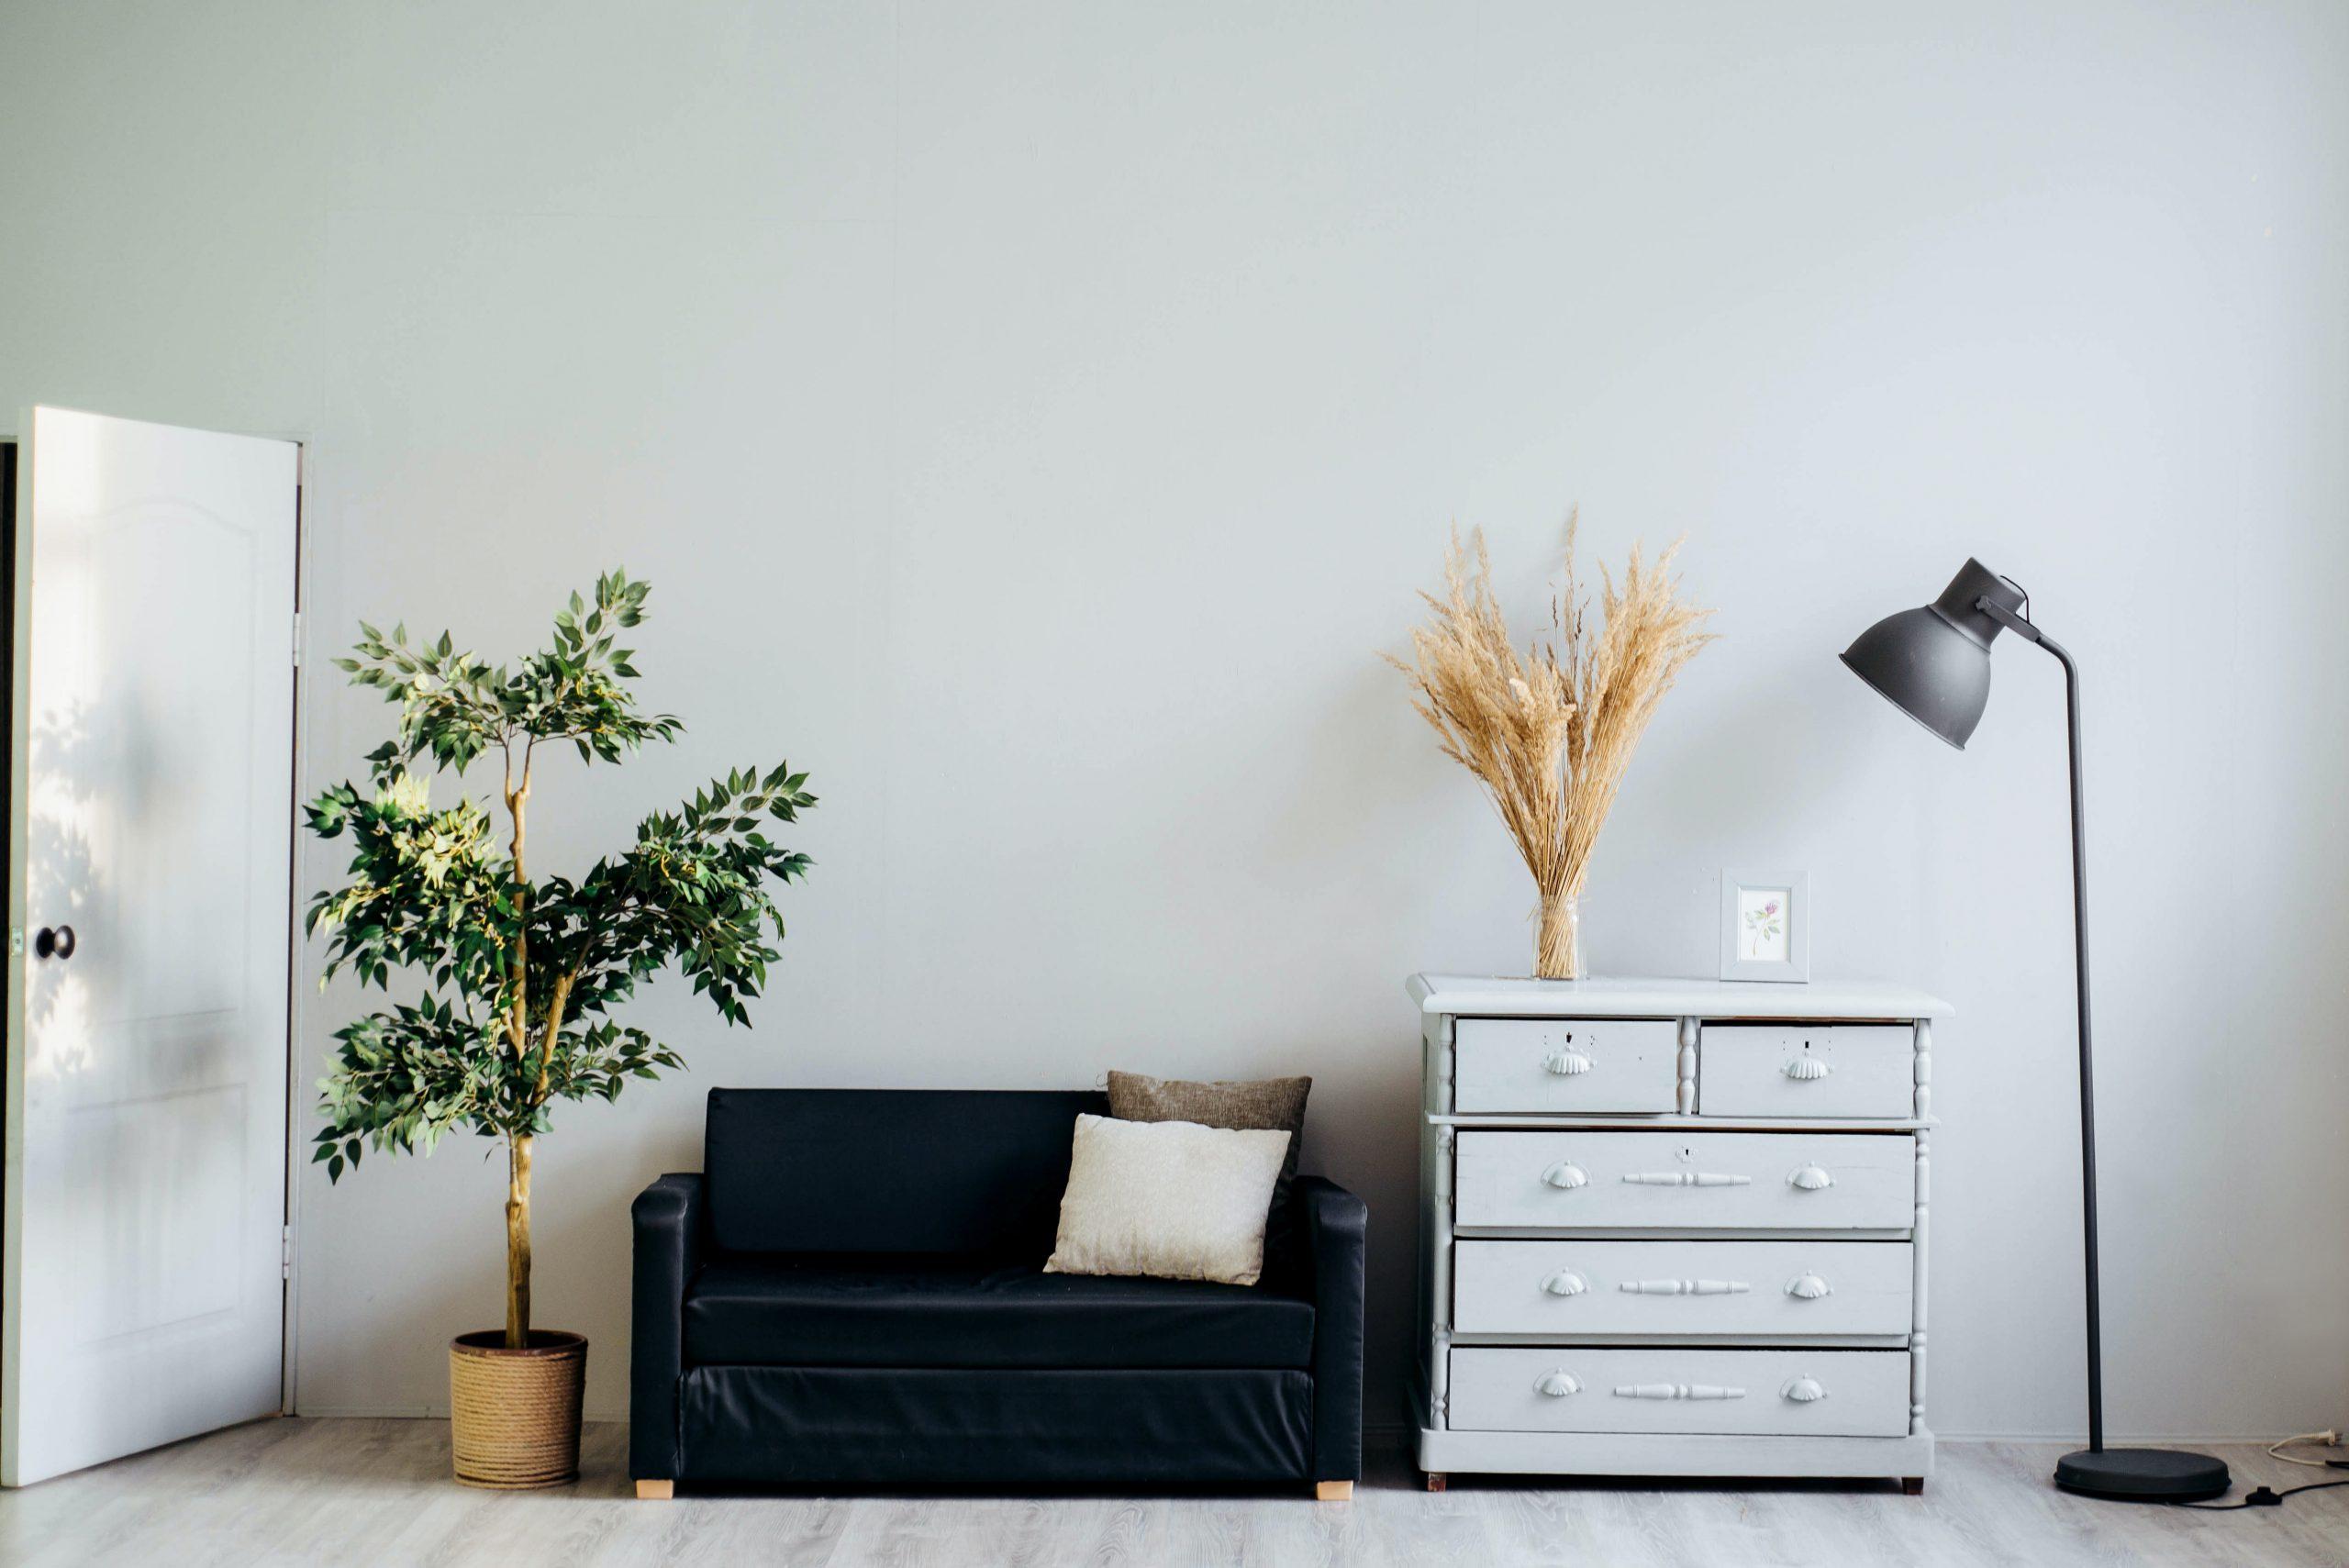 Modern interior design trends for the Winter 2020-2021